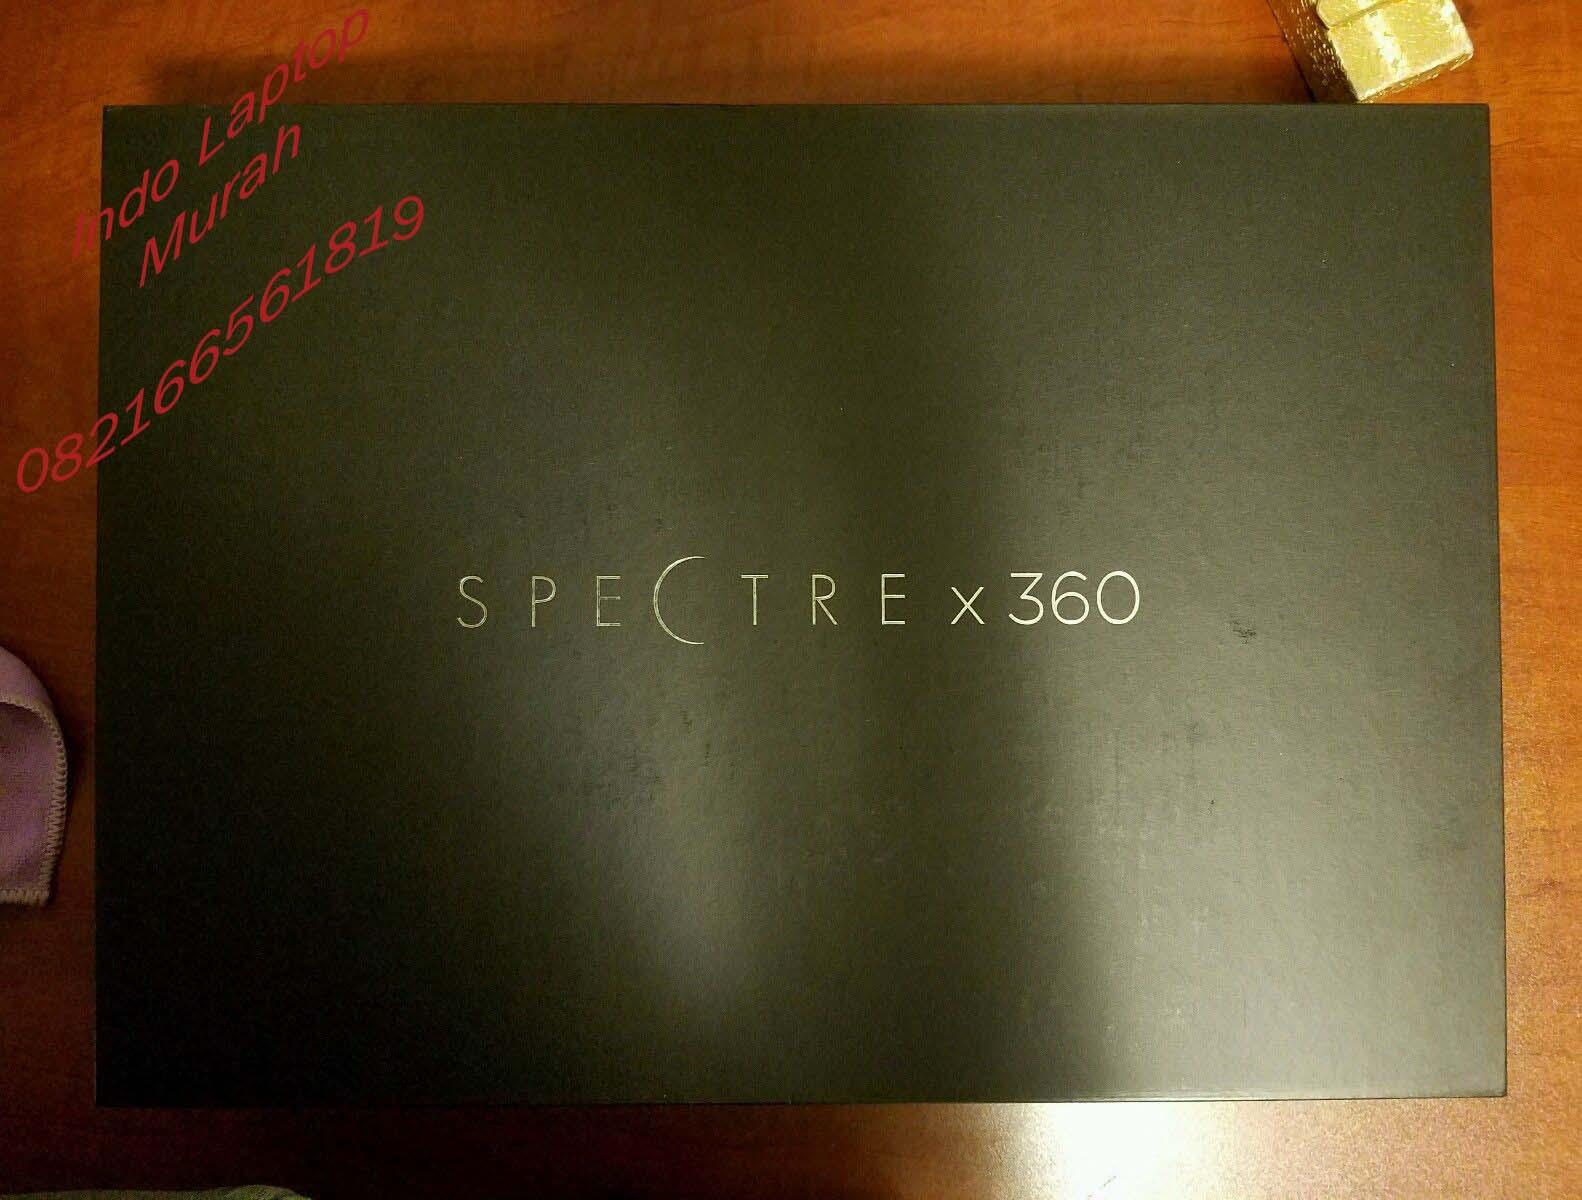 Indo Laptop Murah Lenovo Thinkpad Yoga 12 5300u Black 360 Degree Hp Spectre X360 8gb Ram 256gb Ssd 5th Gen Intel Core I7